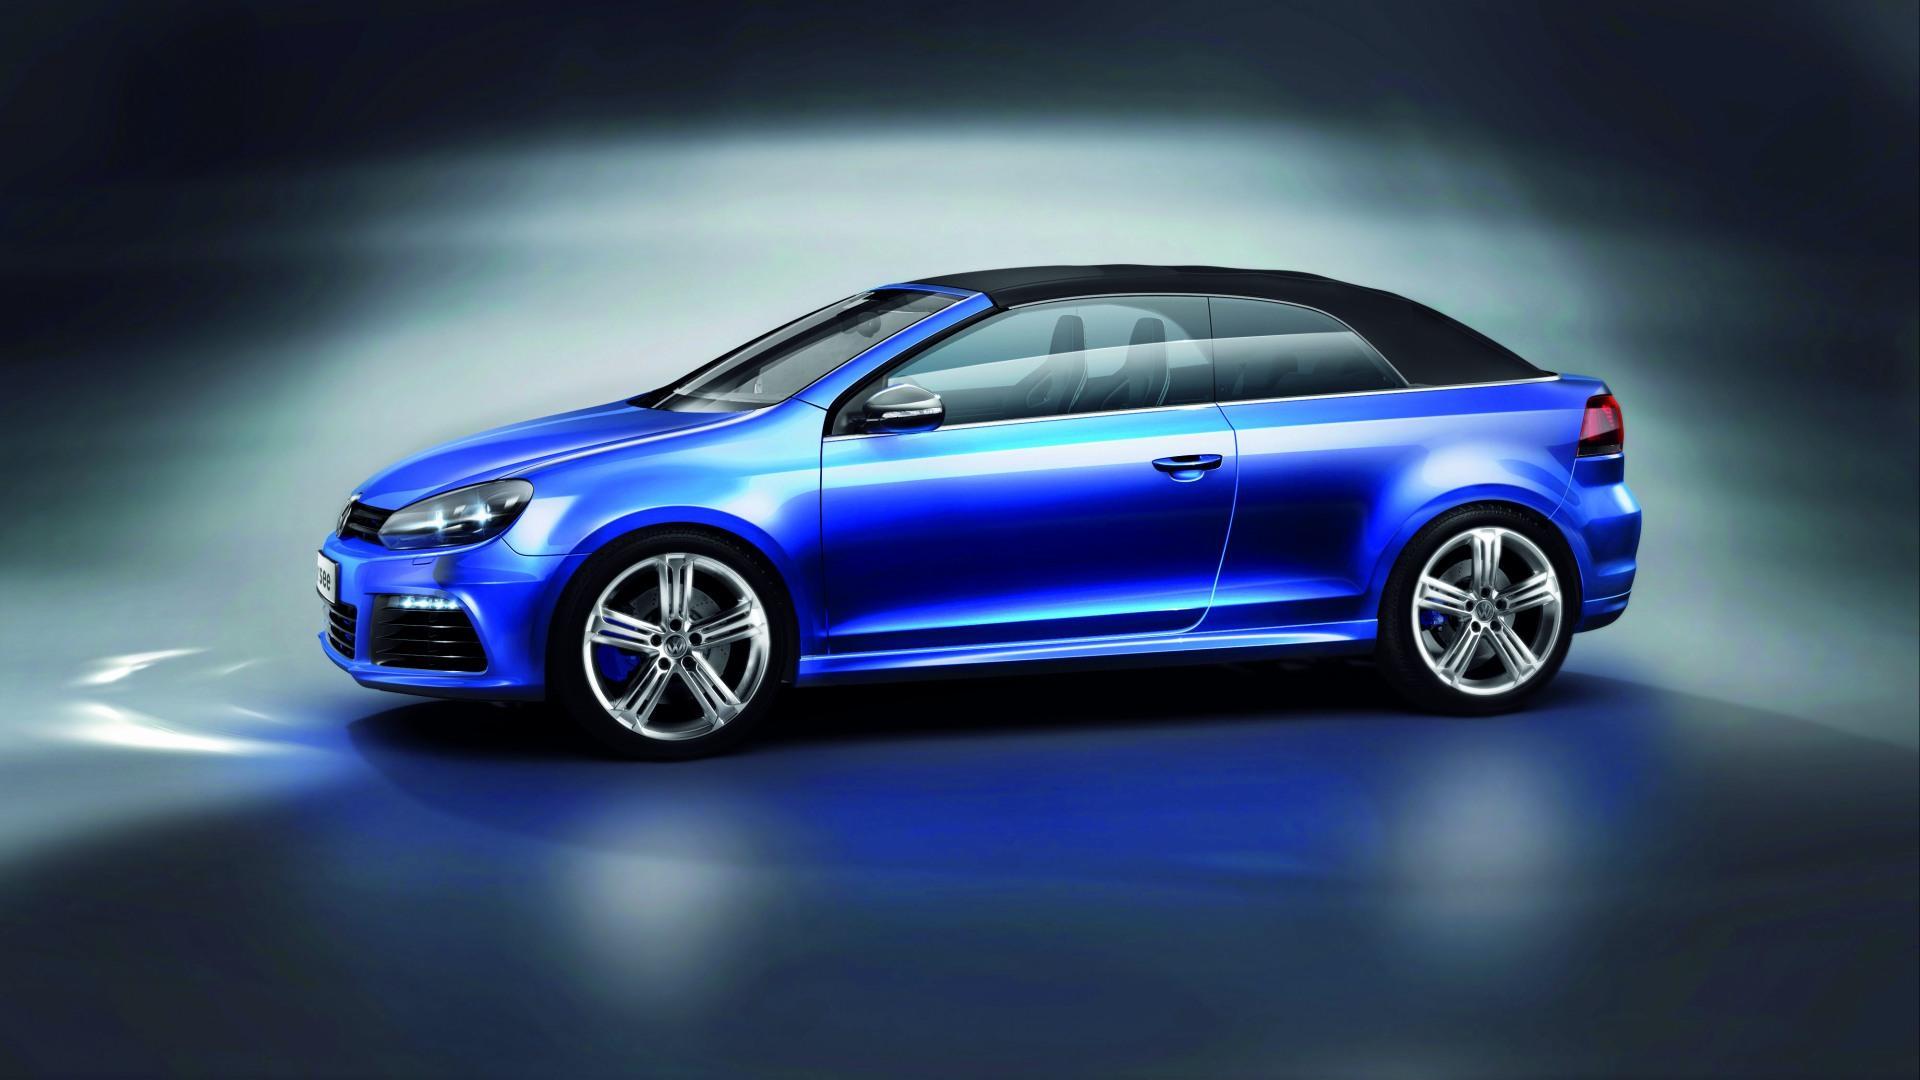 2011 Volkswagen Golf R Concept Images Conceptcarz Com